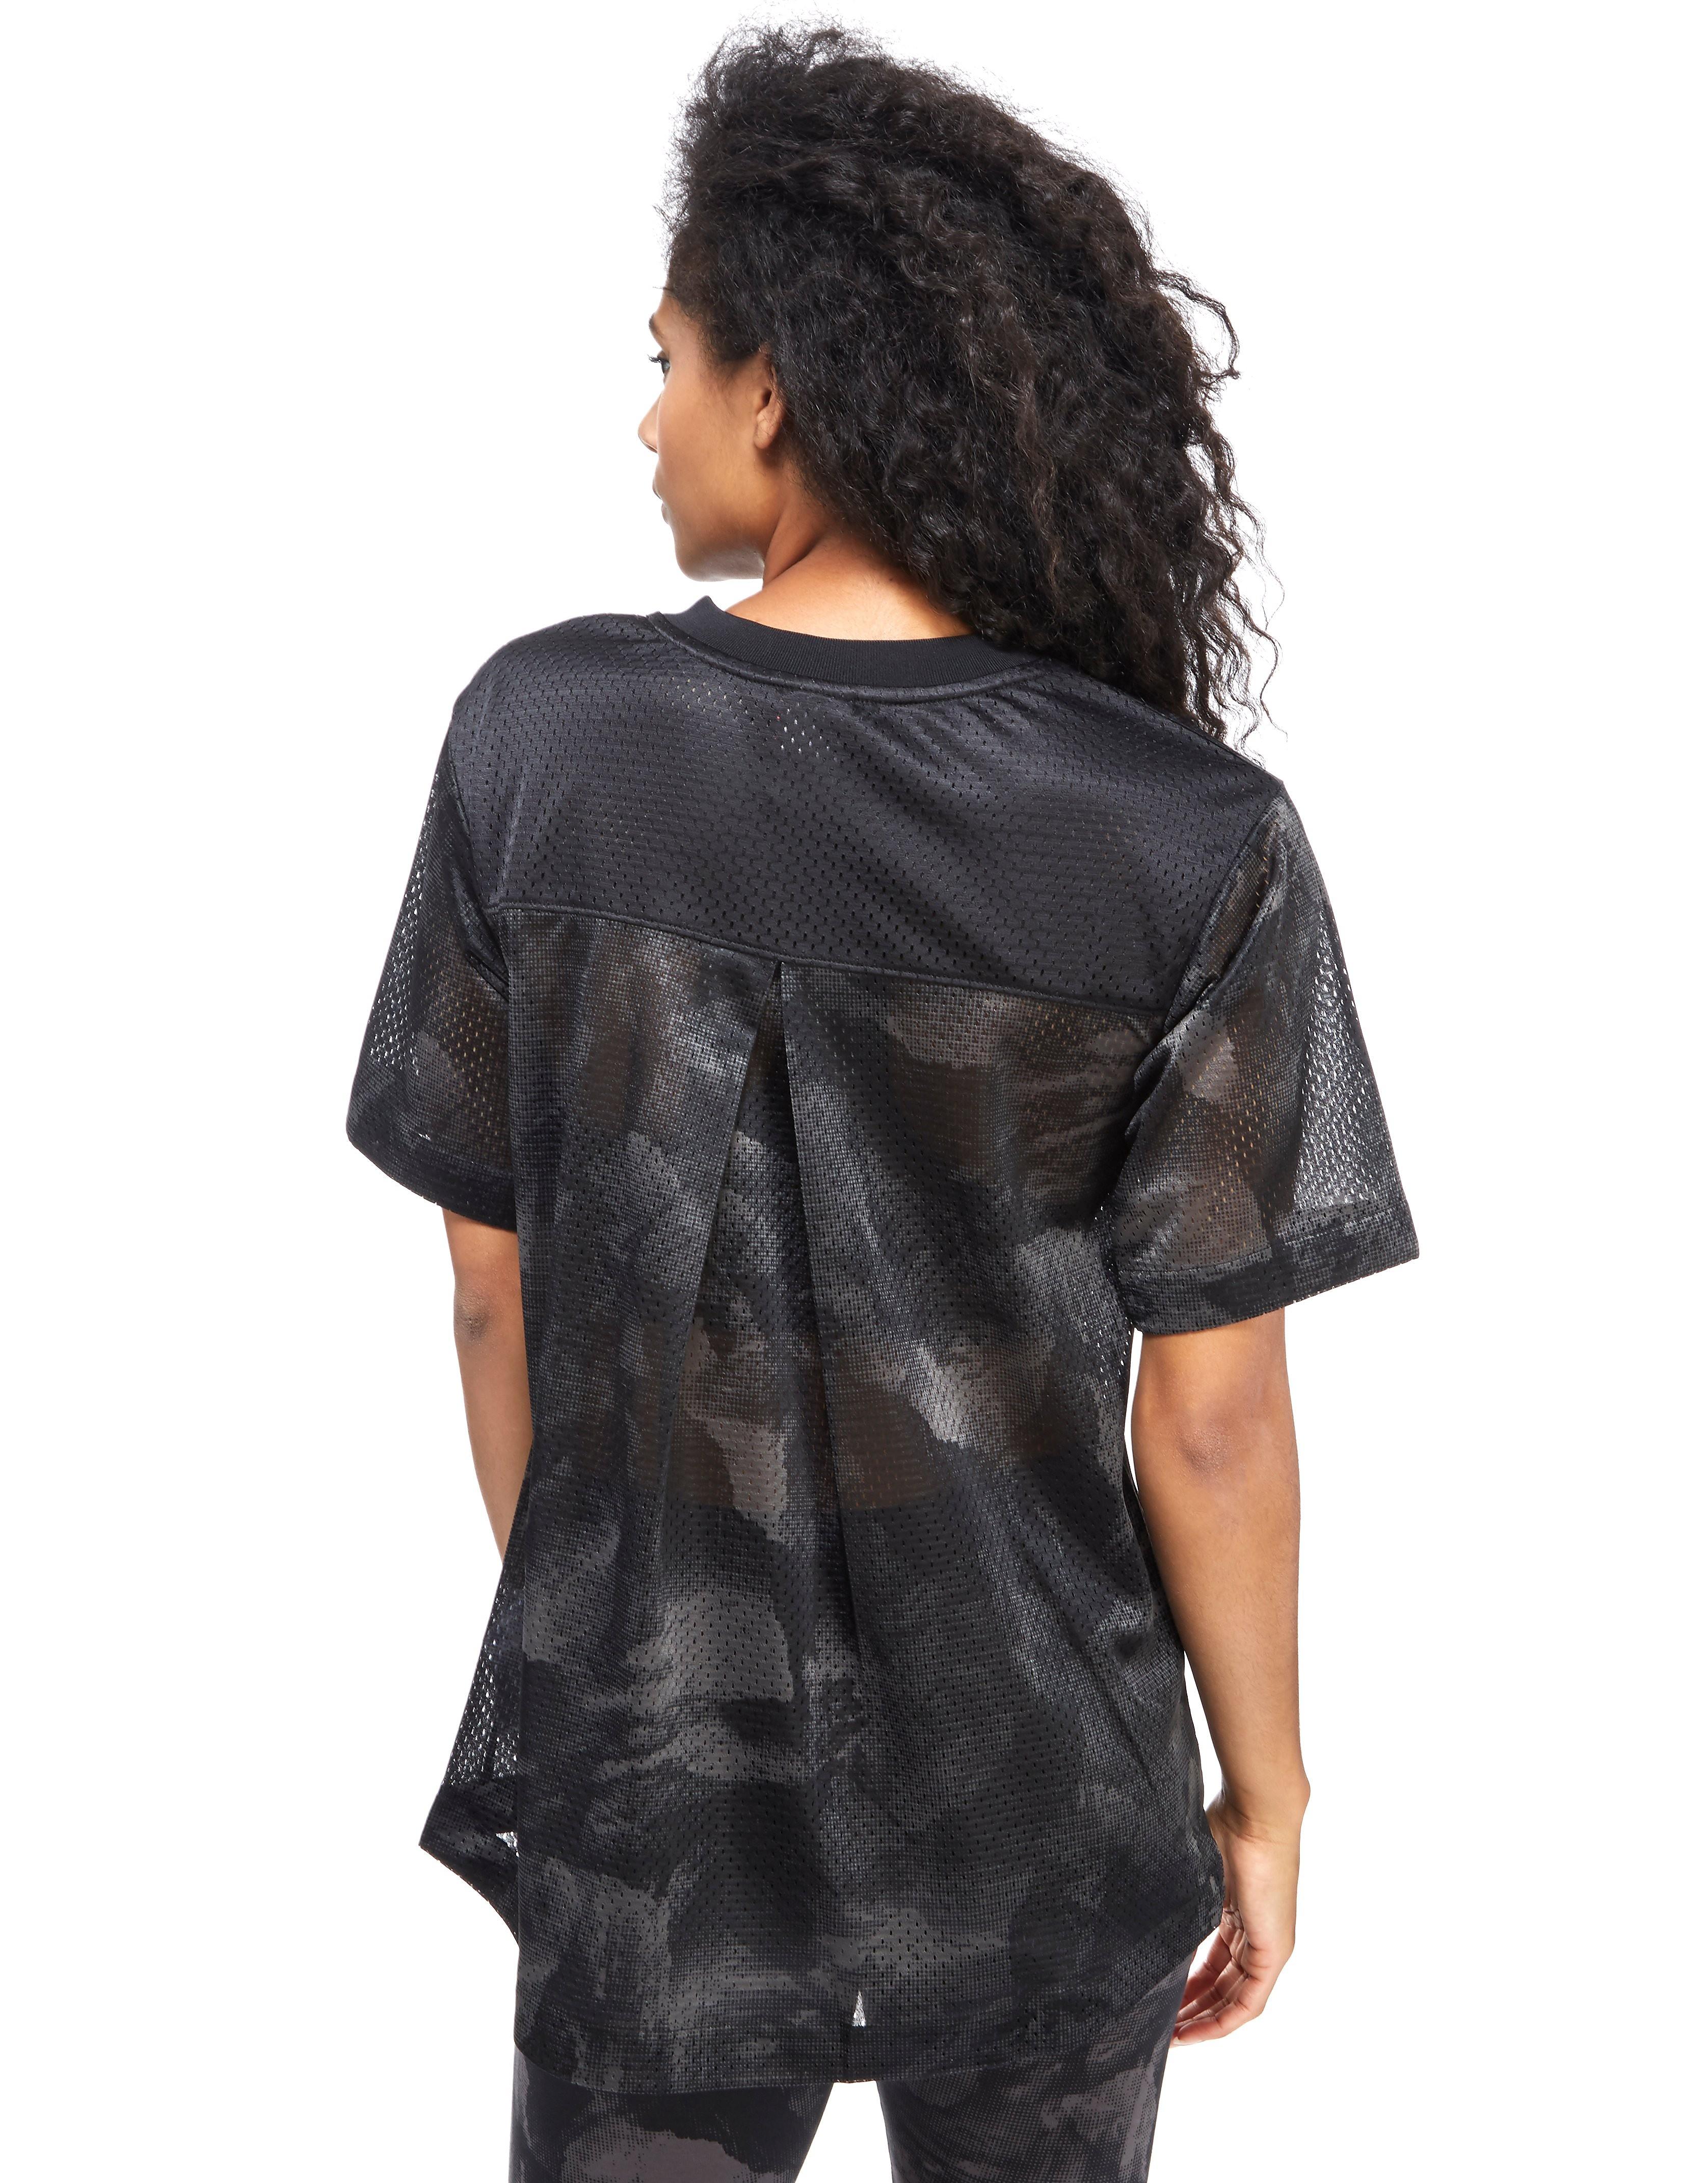 Nike Glacier Allover Print T-shirt